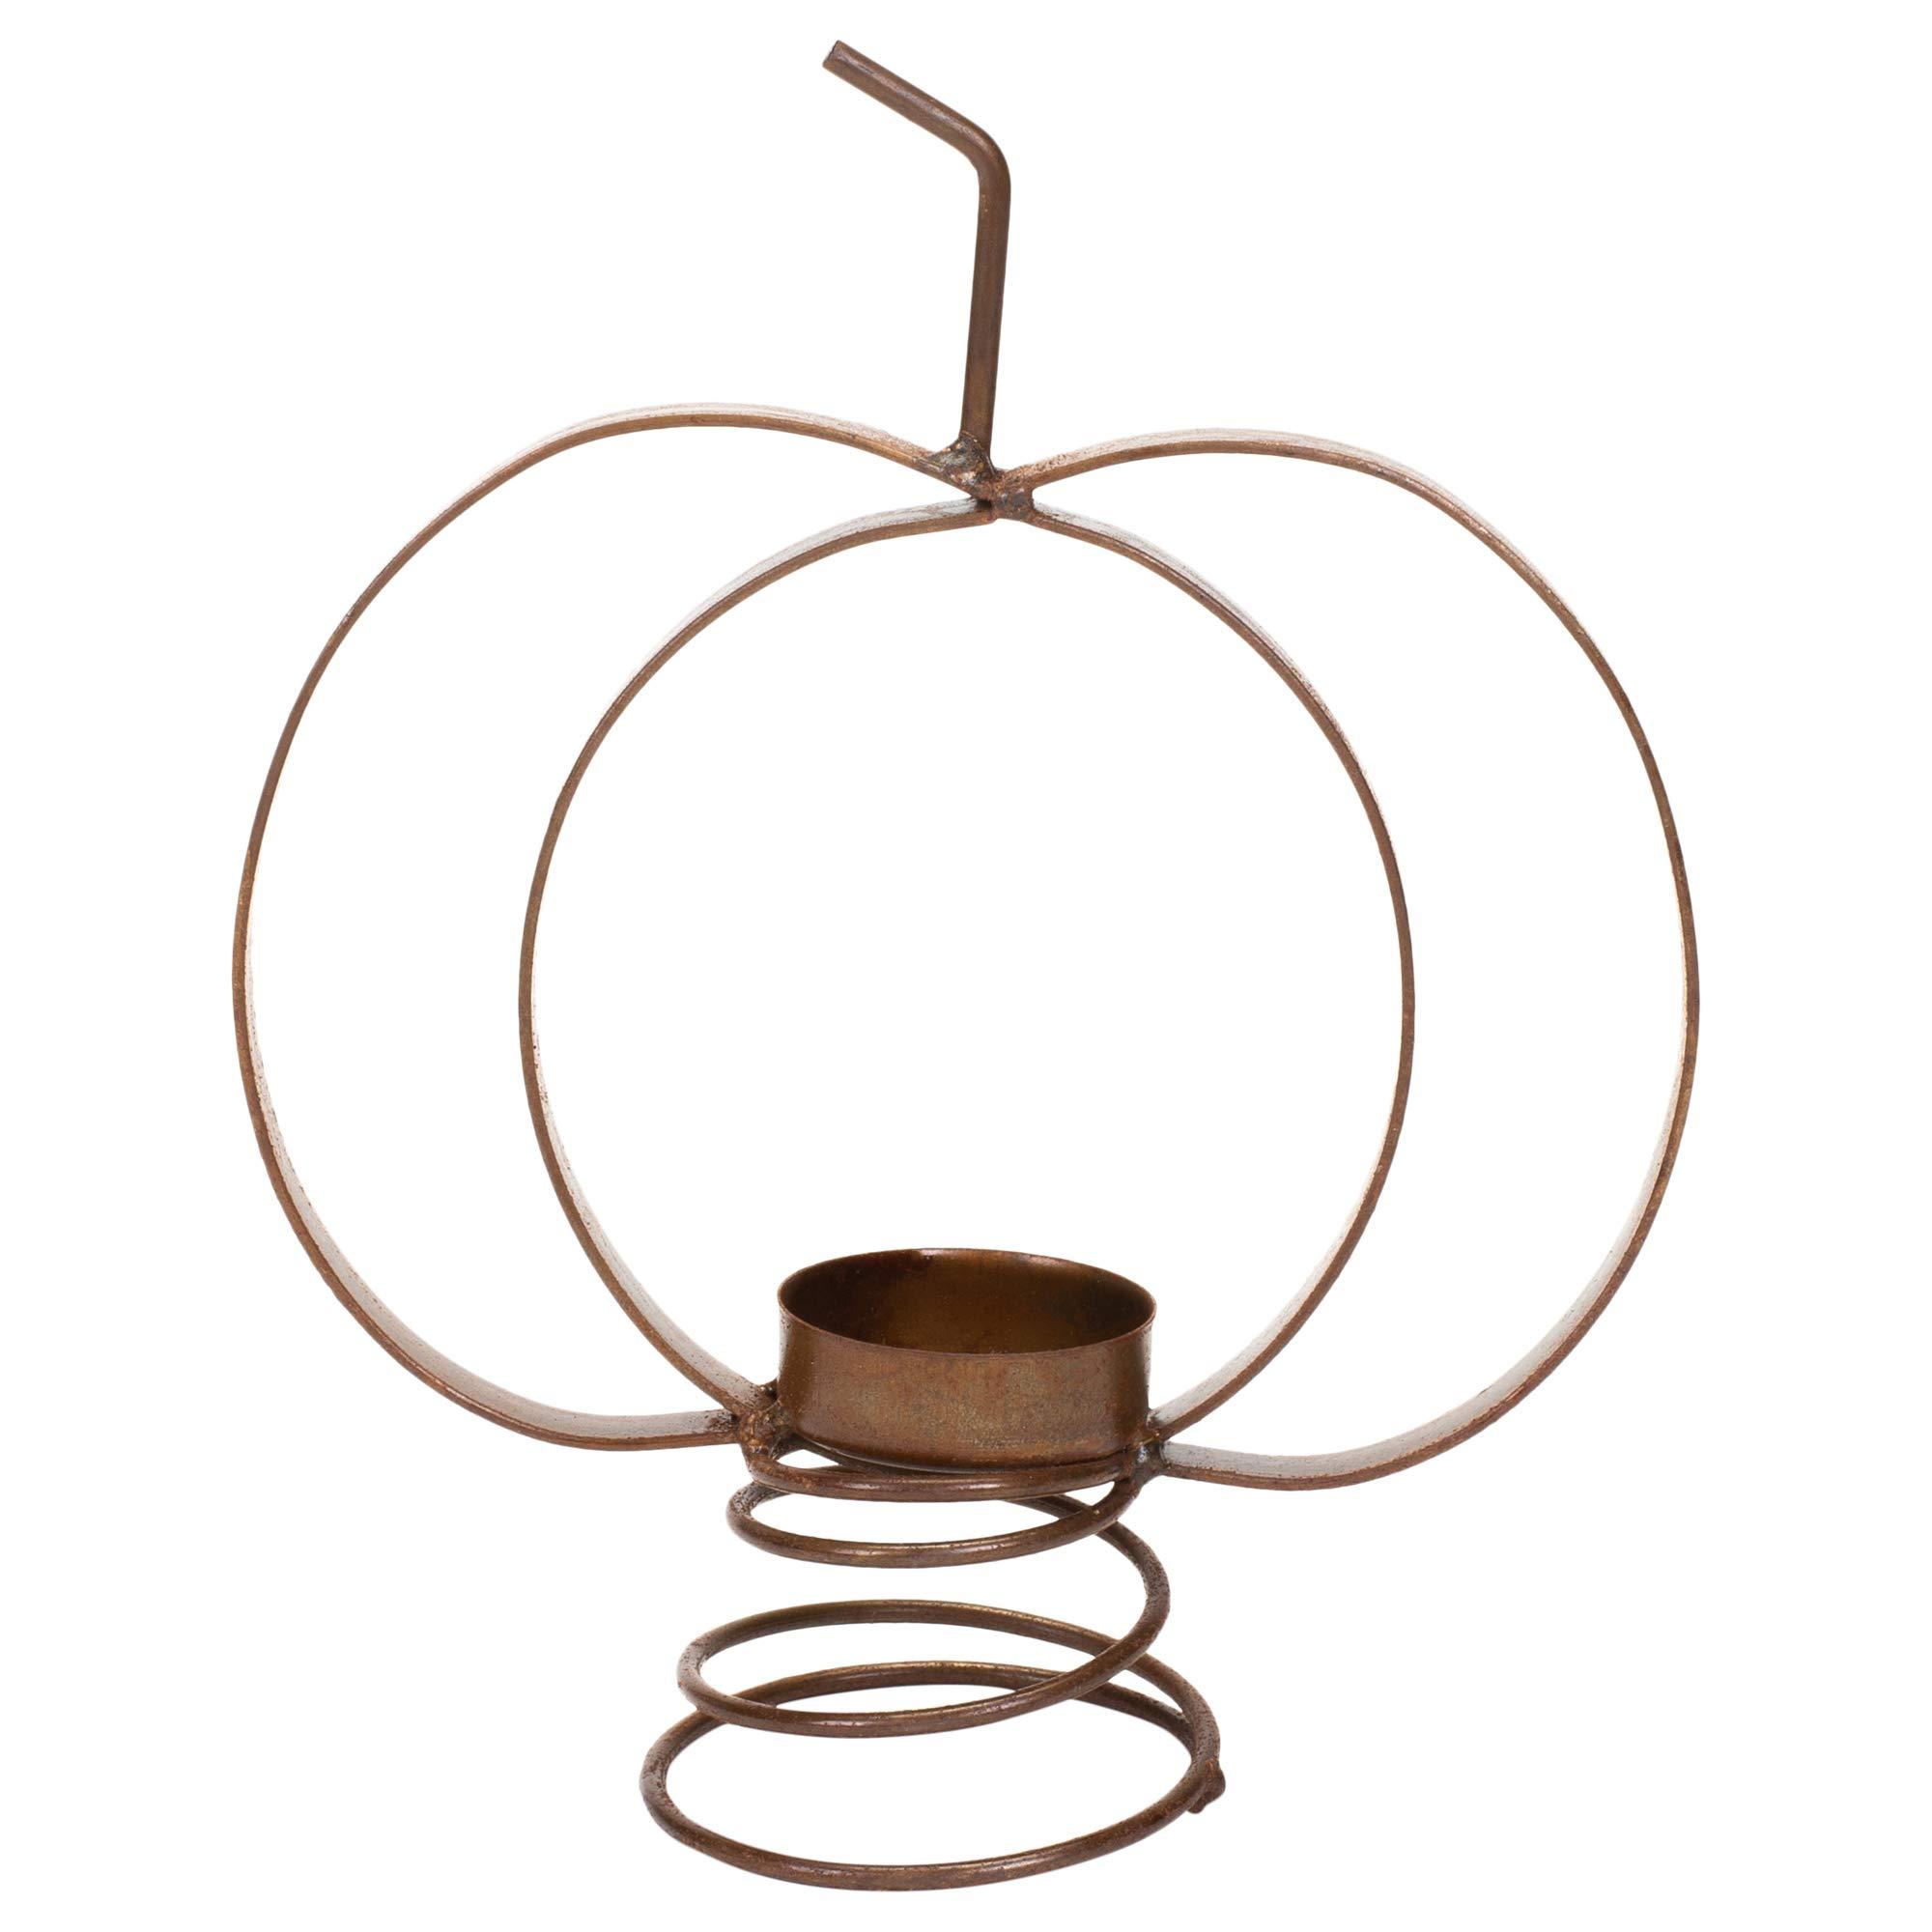 Honey & Me 8'' x 6.25'' Metal Spring Base Pumpkin Shaped Tea Light Candle Holder